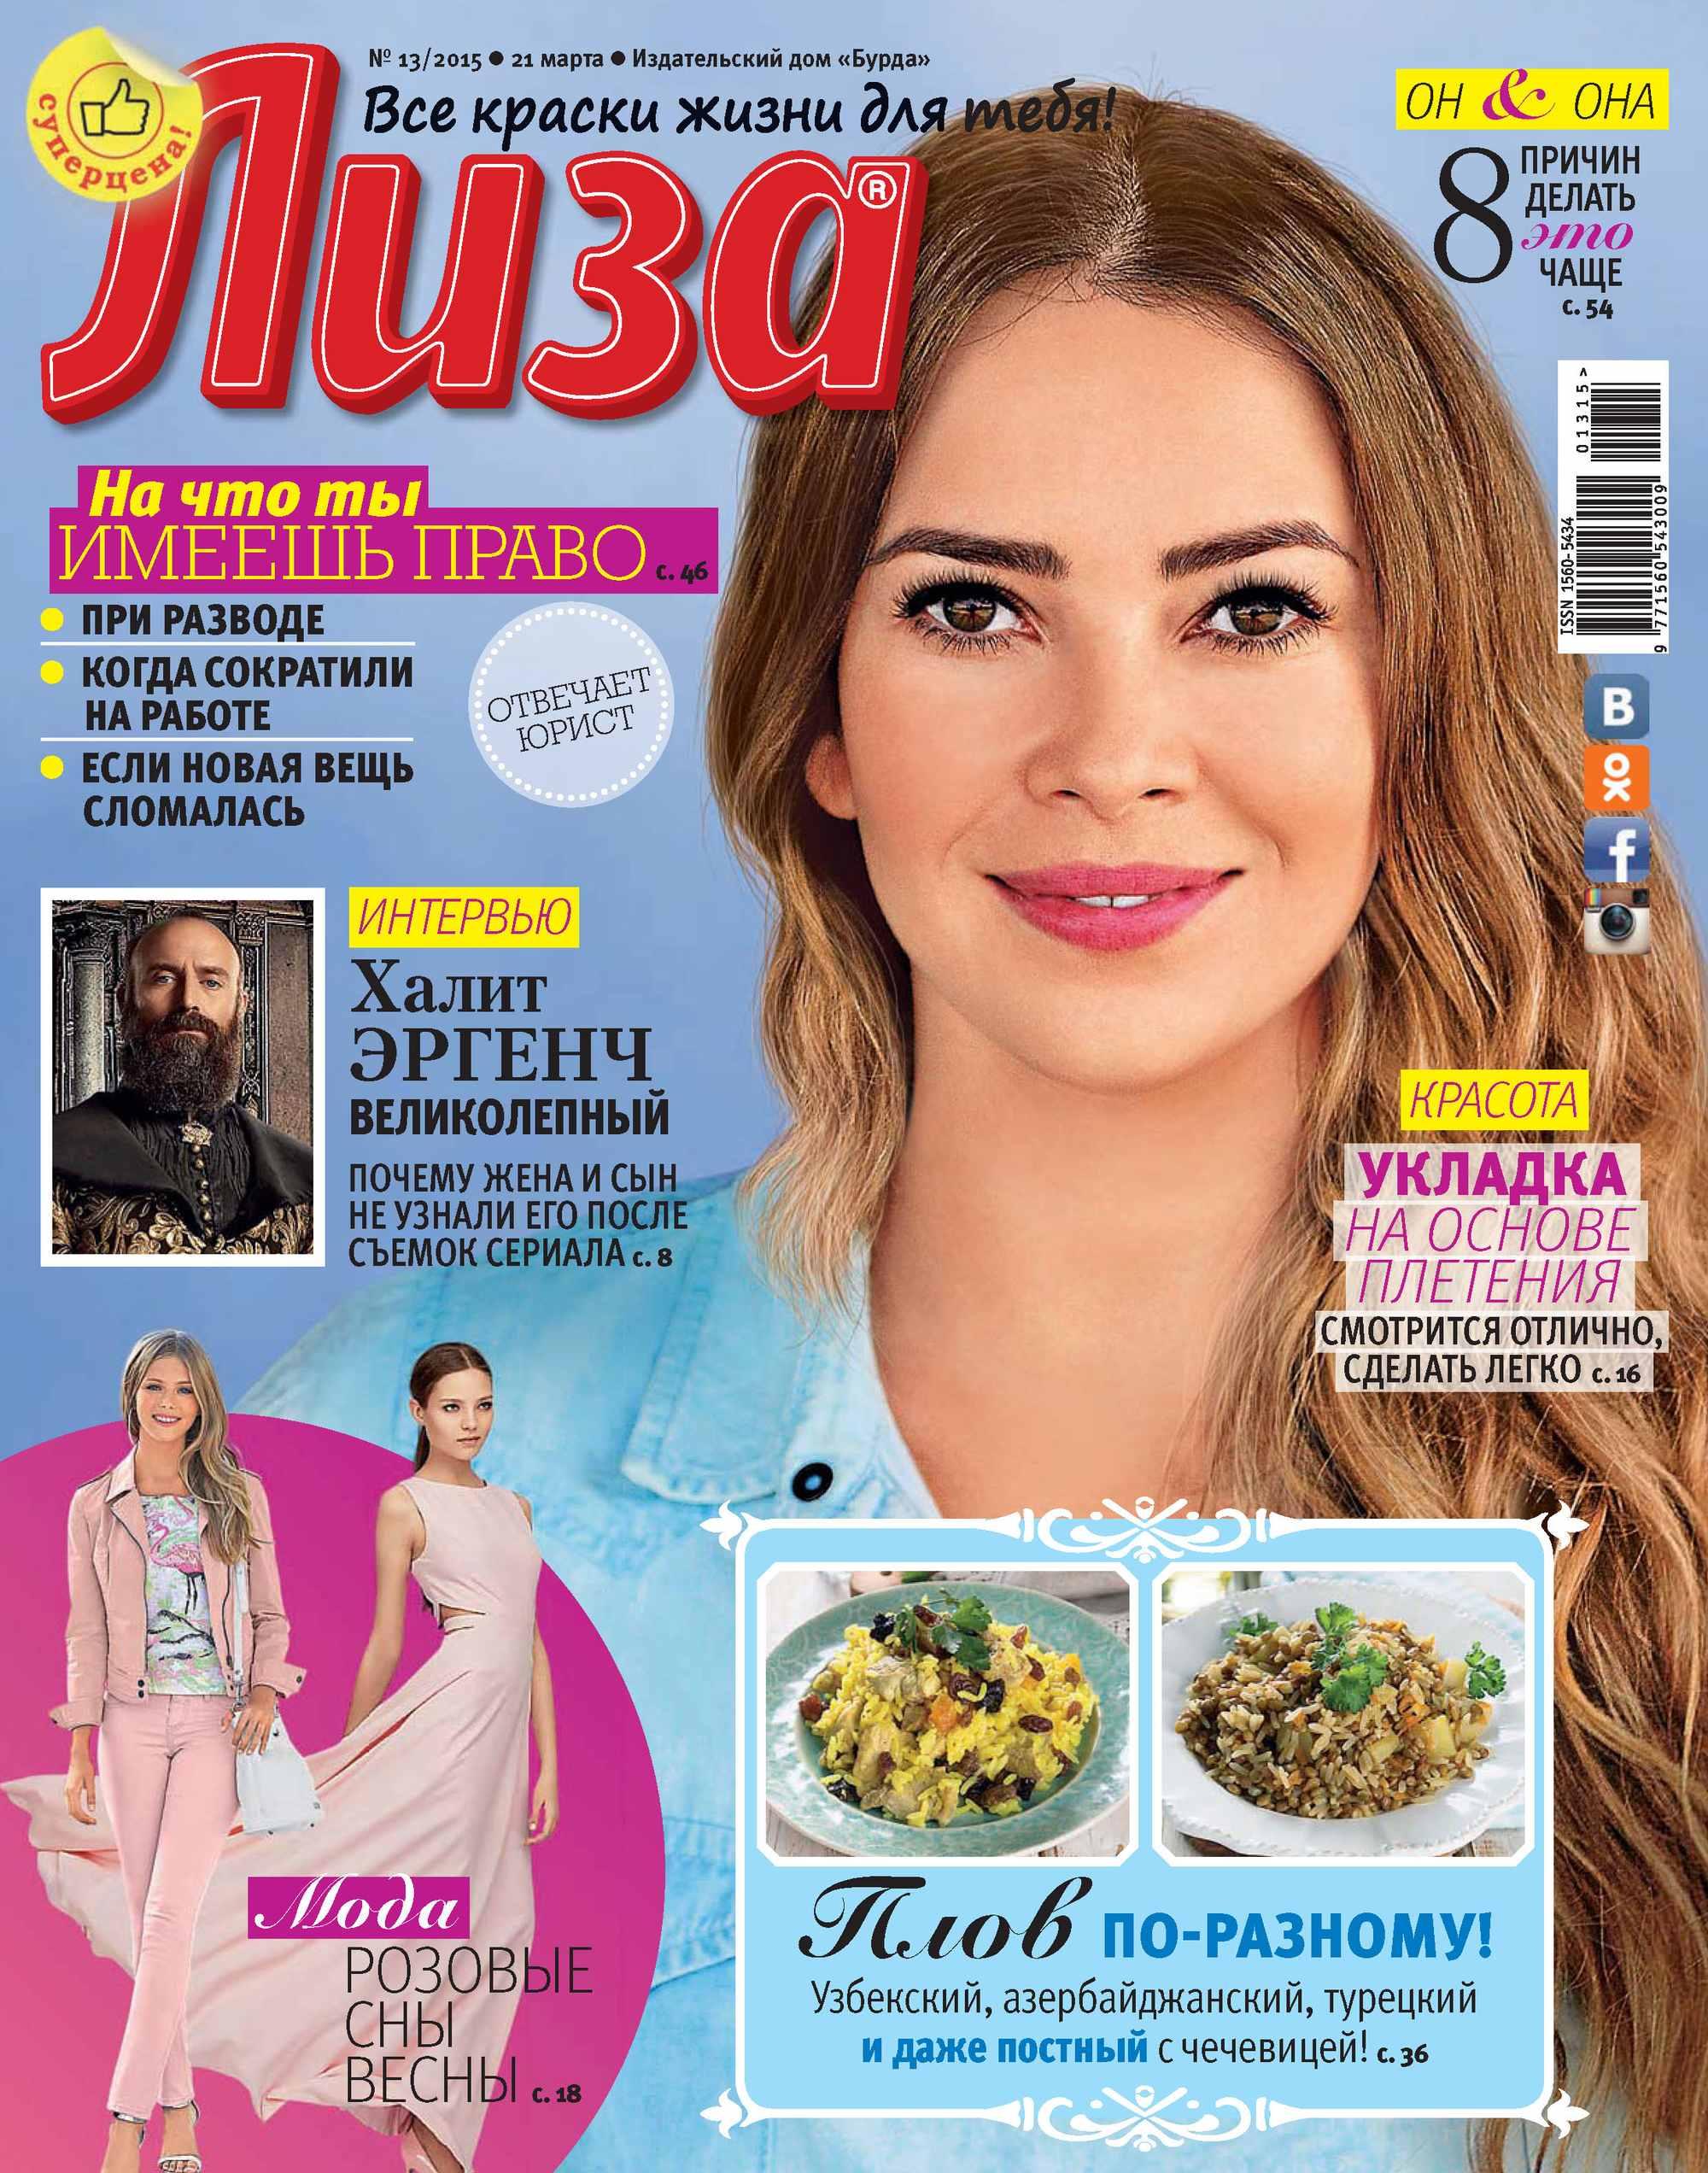 ИД «Бурда» Журнал «Лиза» №13/2015 журнал лиза бурда